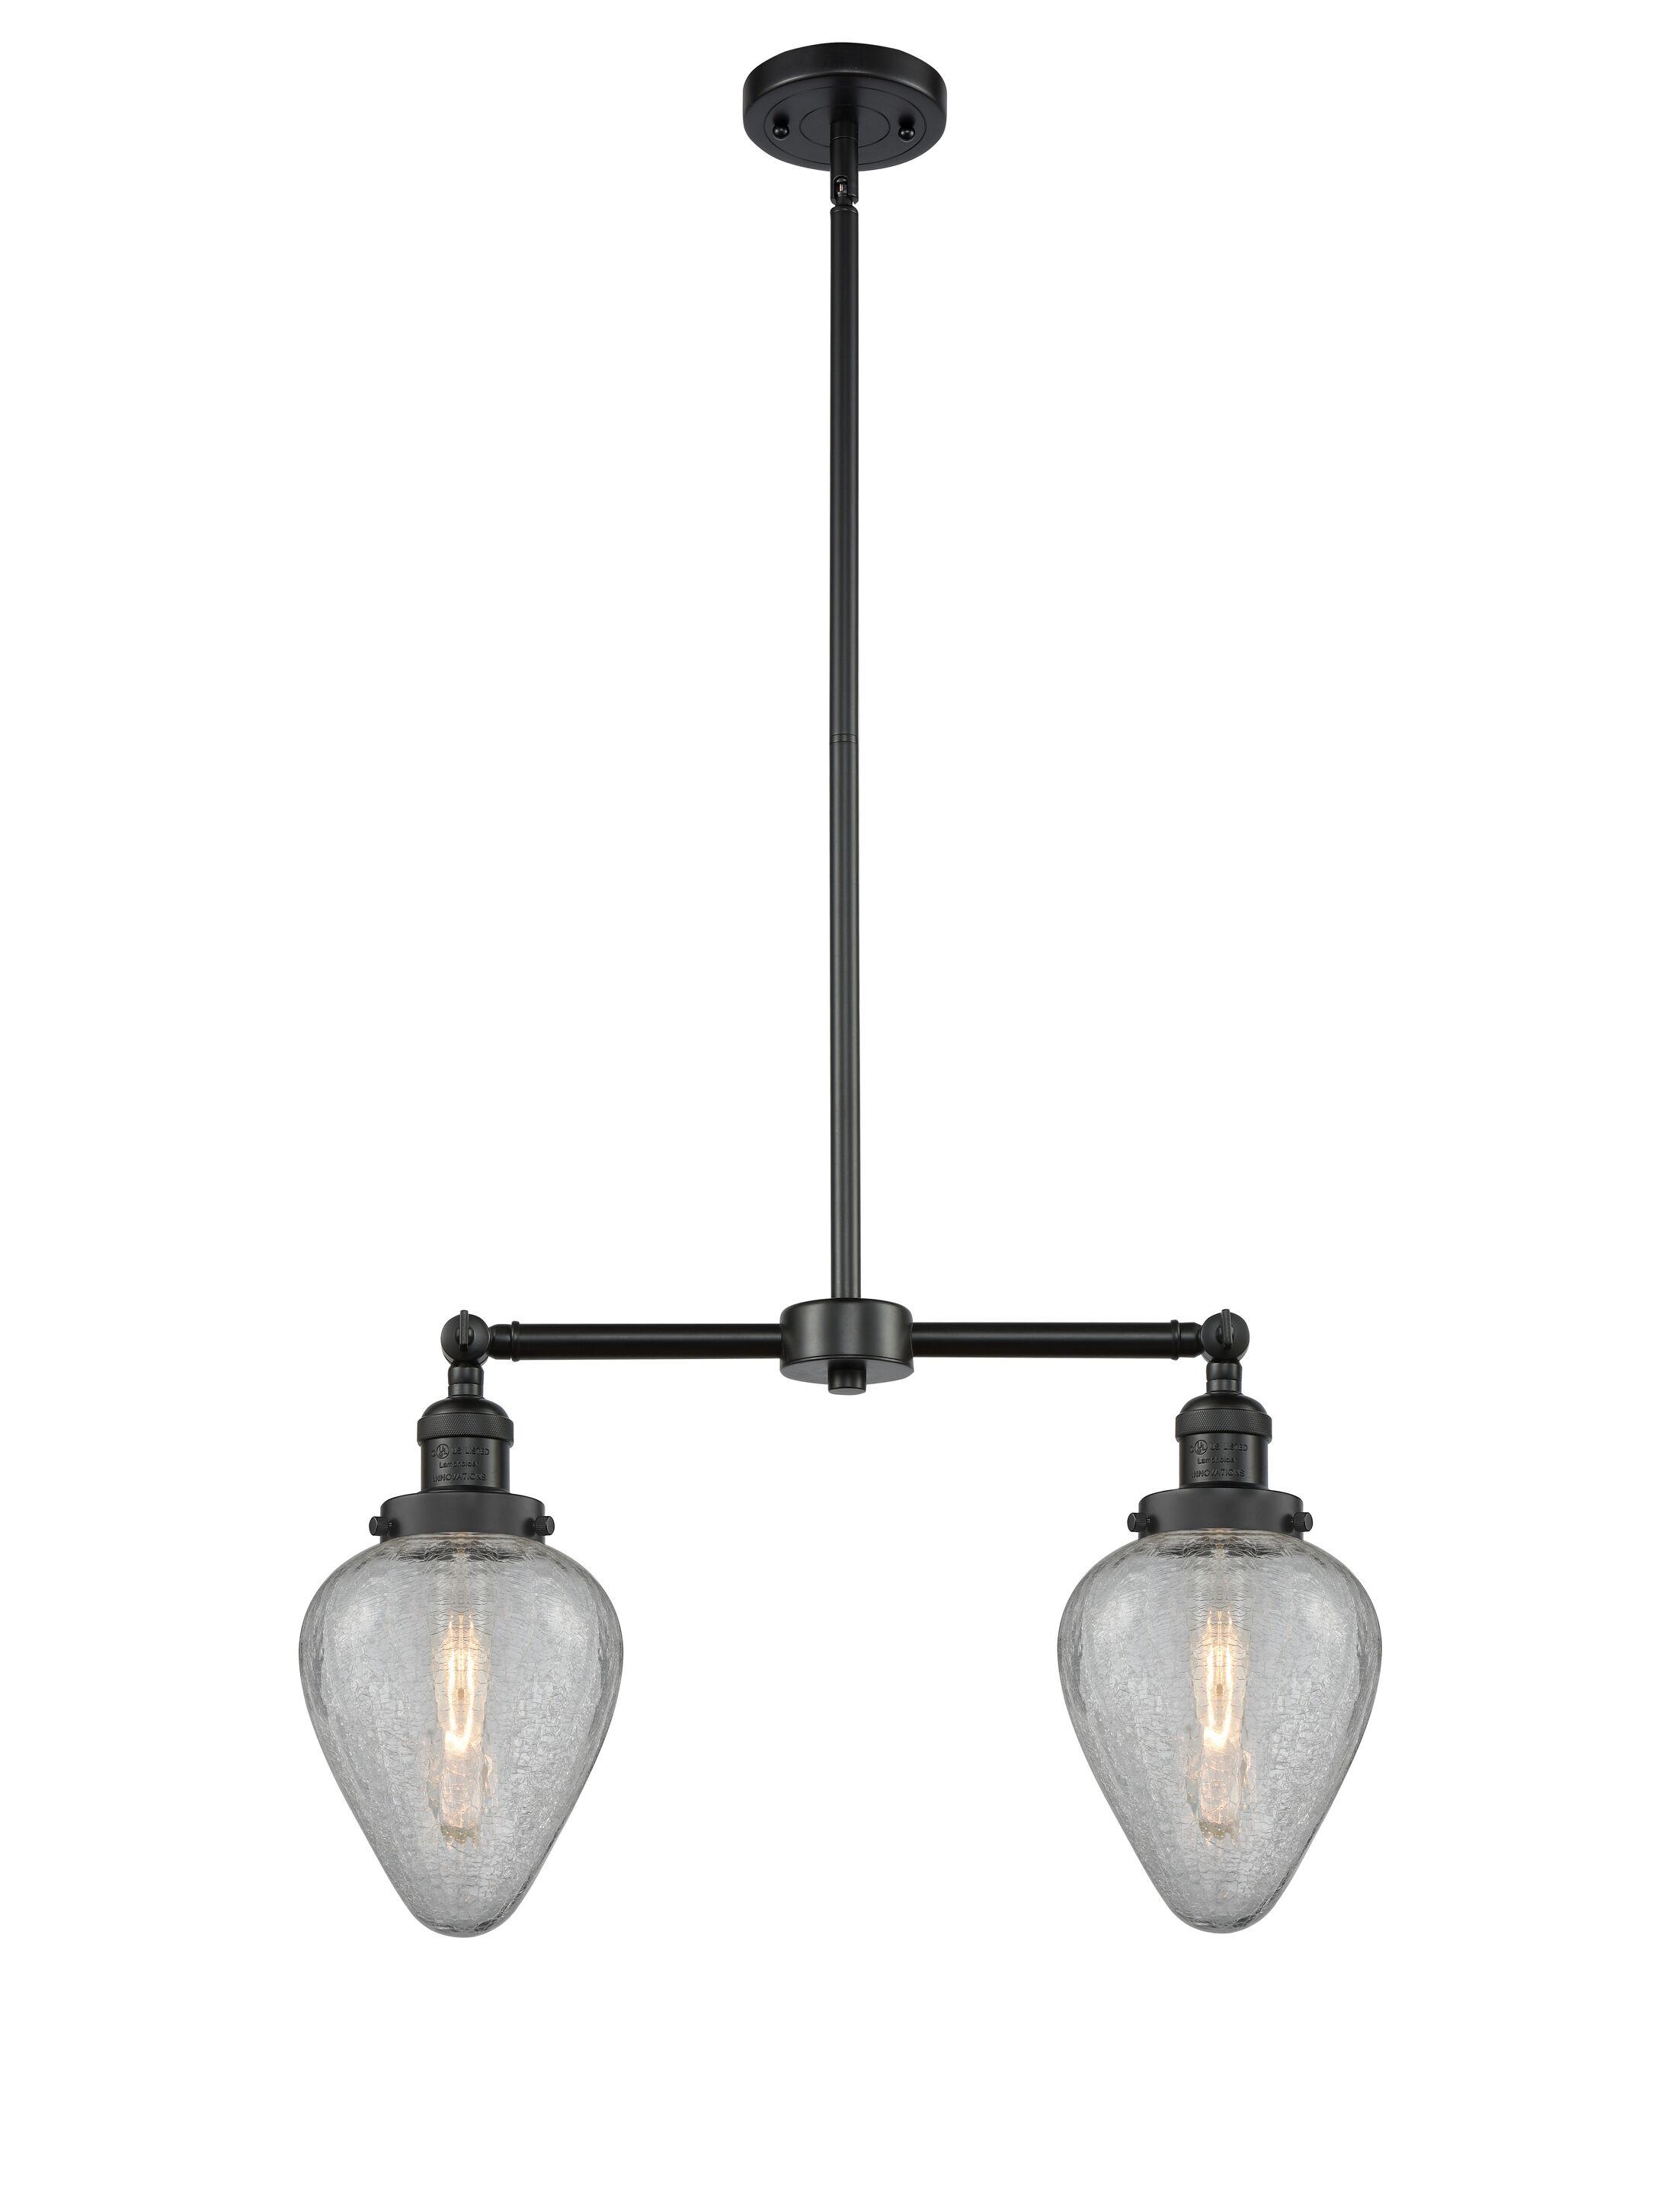 Bontrager 2-Light Kitchen Island Pendant Bulb Type: Incandescent, Finish: Matte Black